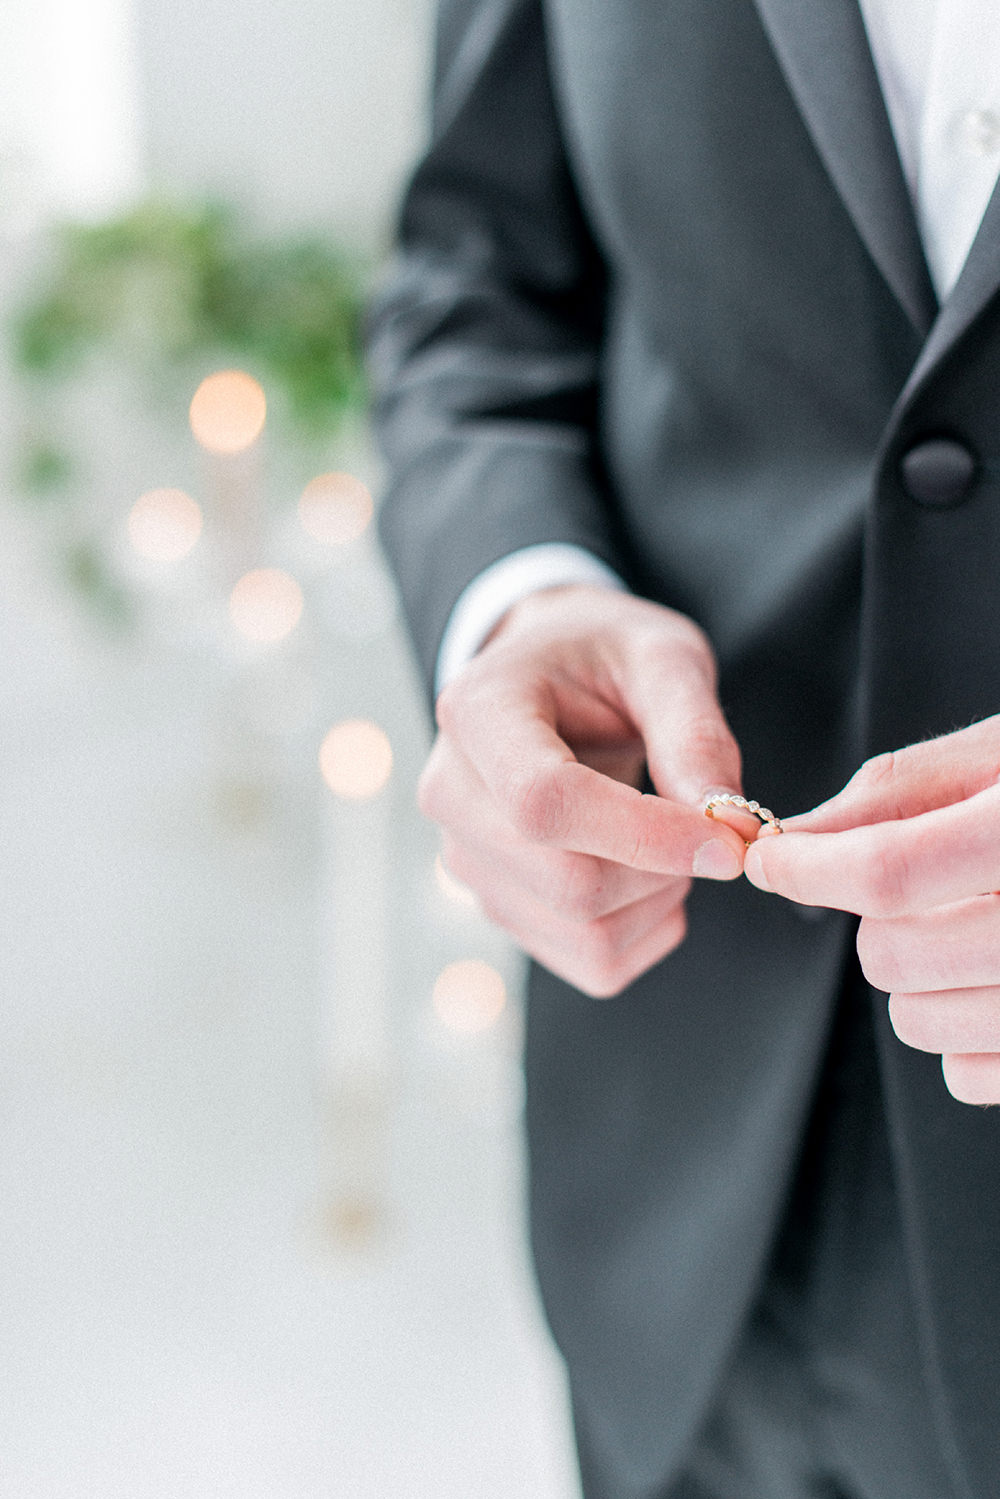 wedding rings - photo by Laura Kelly Photography https://ruffledblog.com/minimalist-monochrome-european-wedding-inspiration